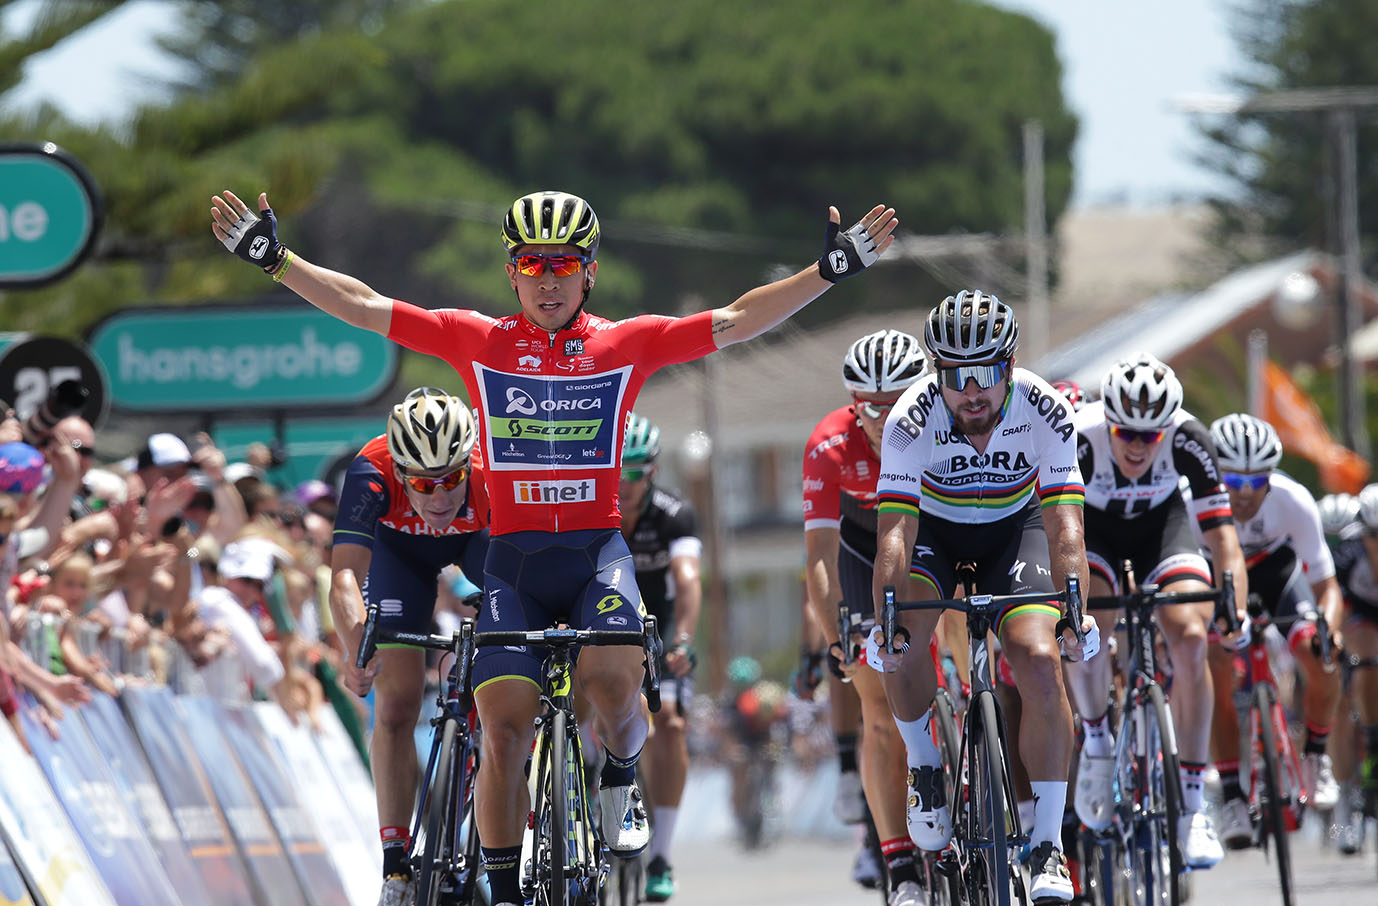 Orica-Scott's Caleb Ewan wins Hansgrohe Stage 3 into Victor Harbor